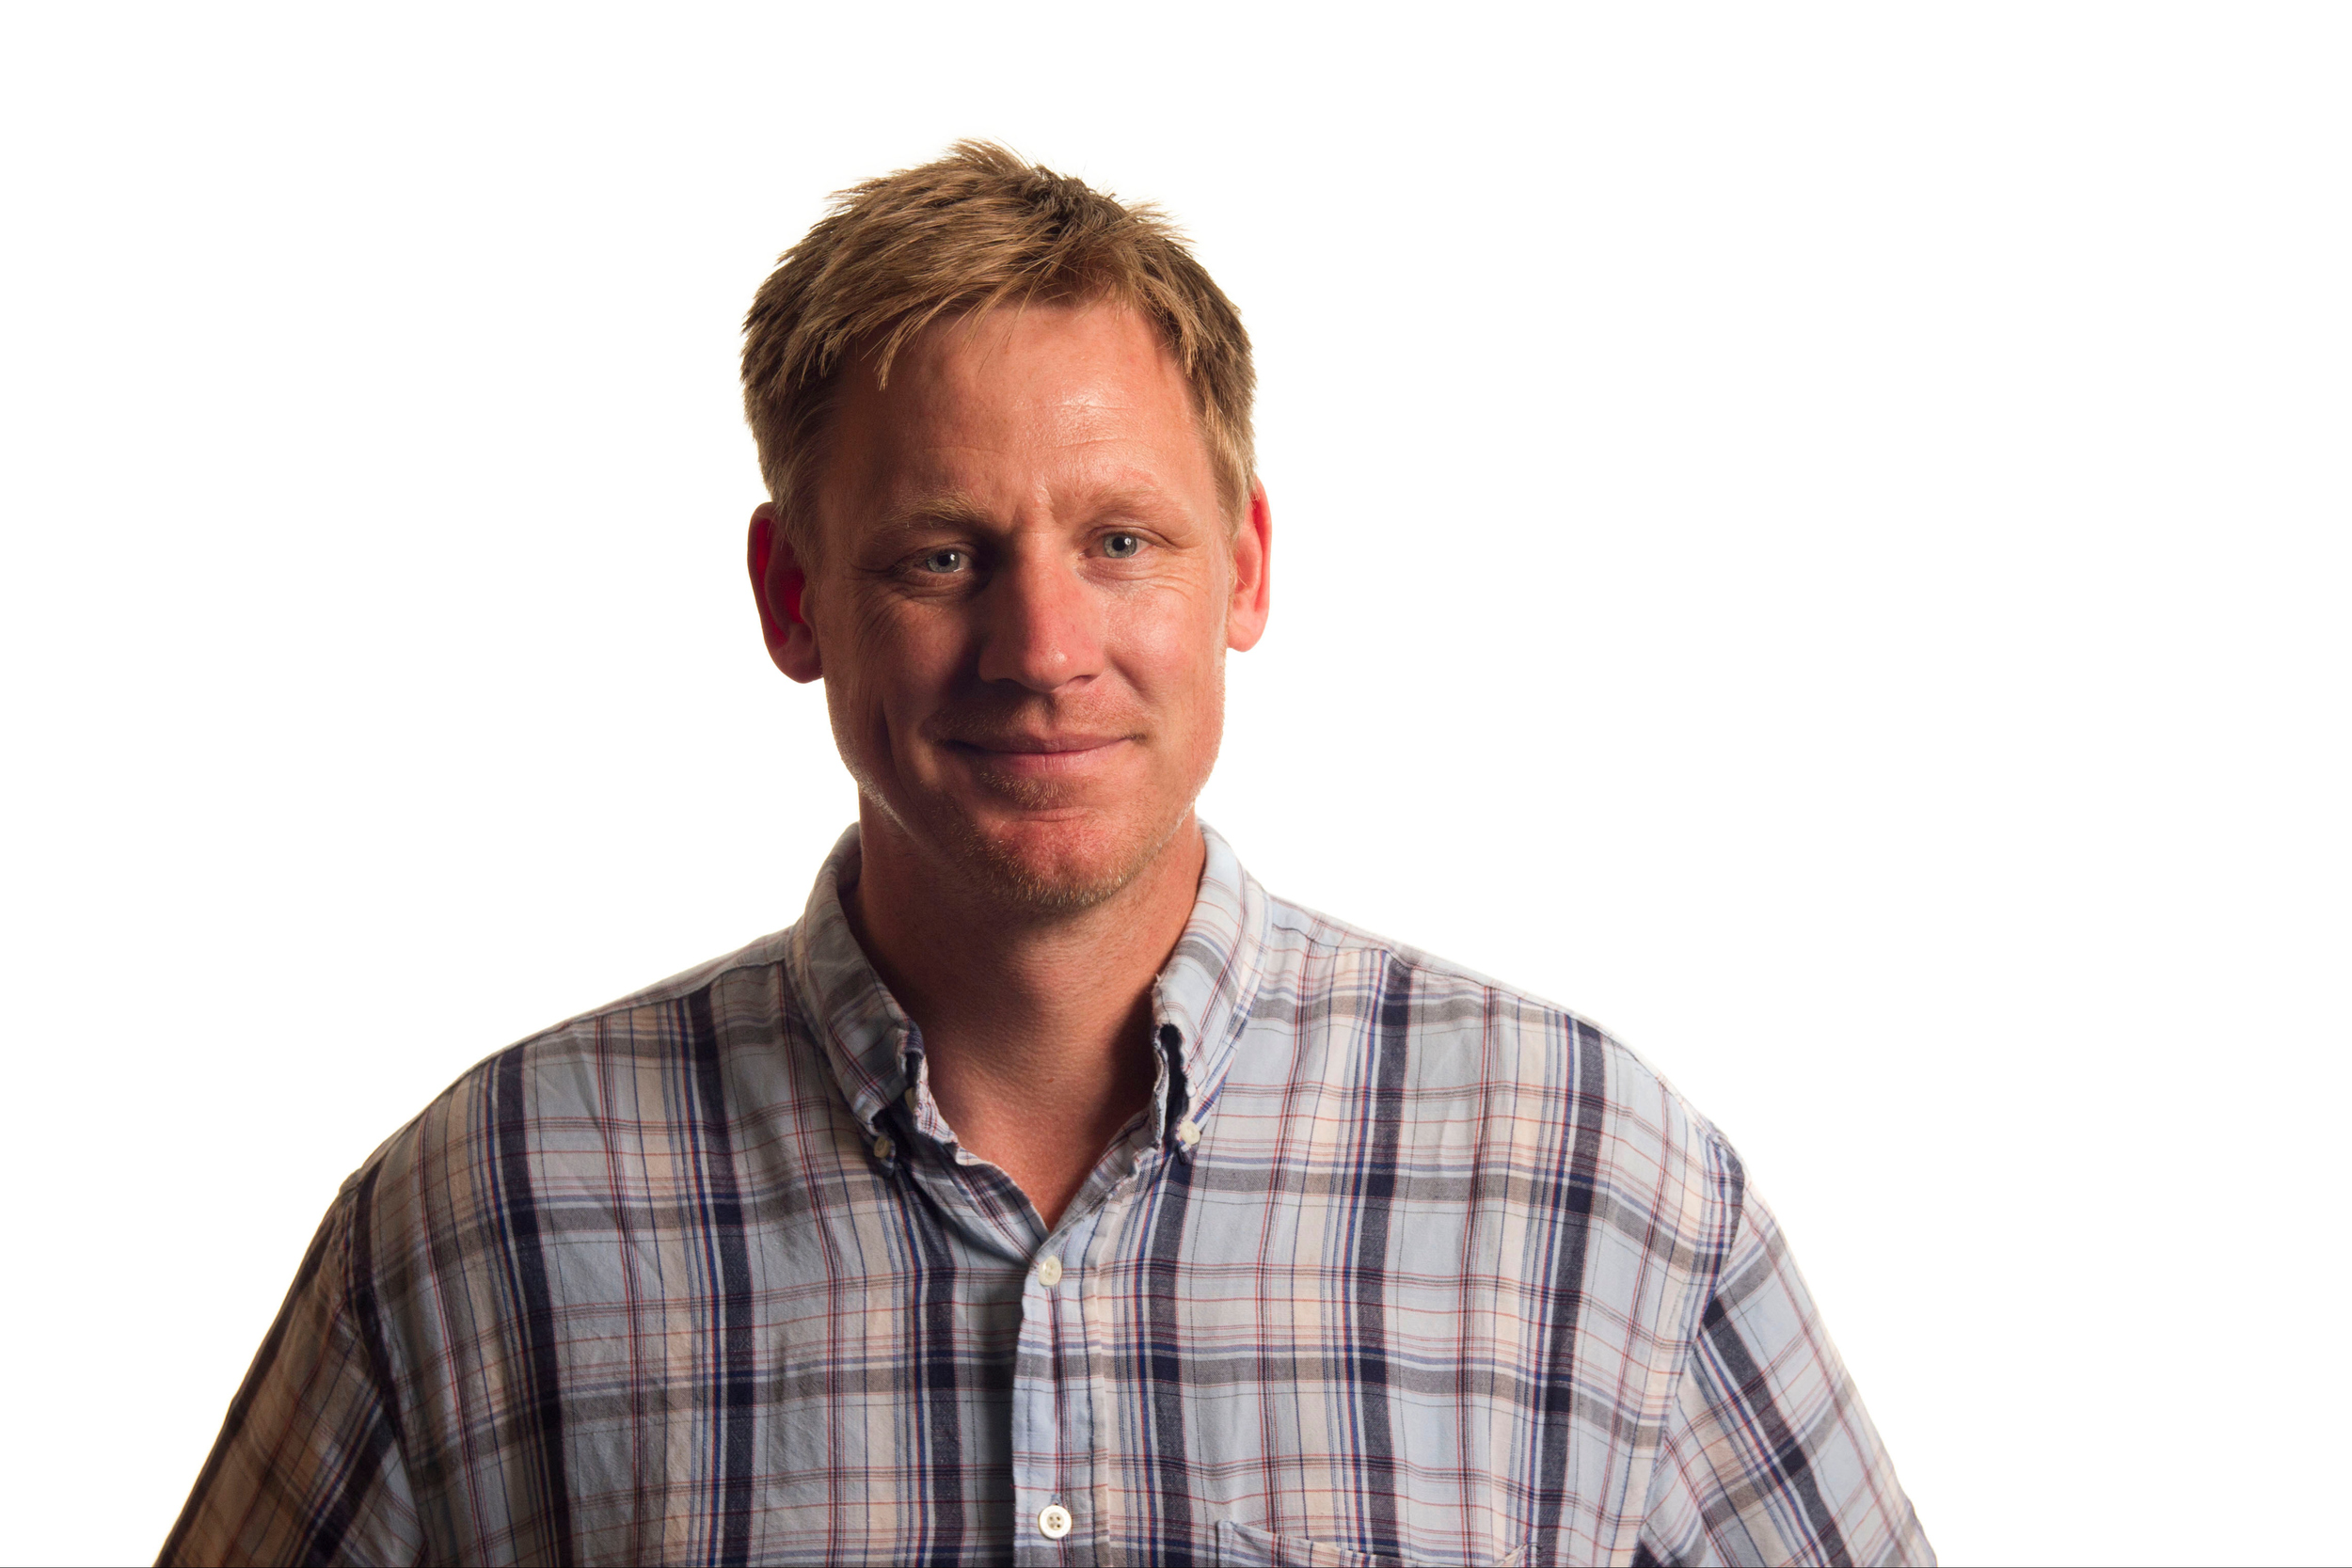 Bruce Ely, Oregonian